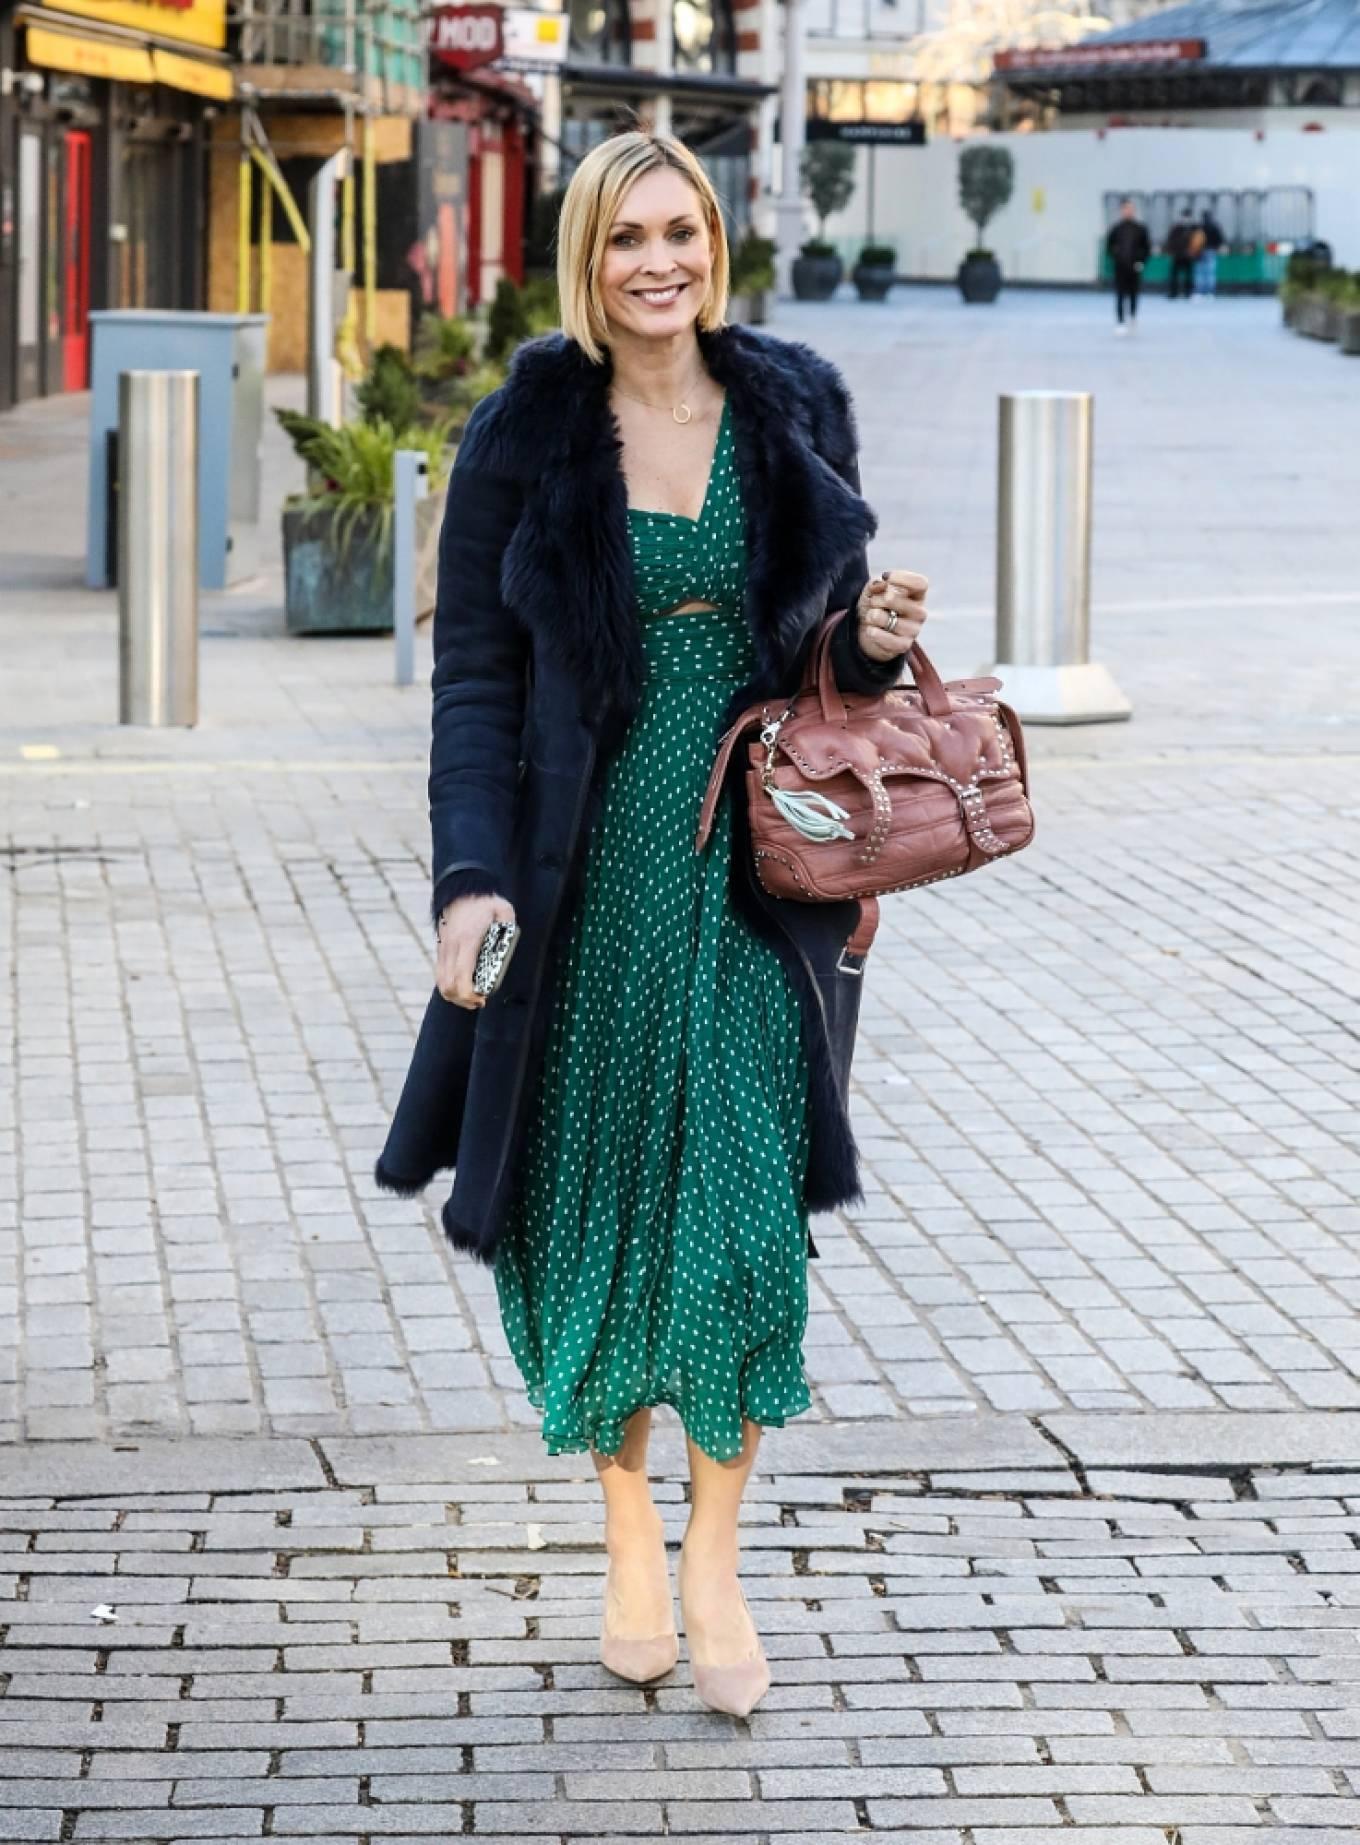 Jenni Falconer - In a green maxi dress at the Global Radio Studios in London